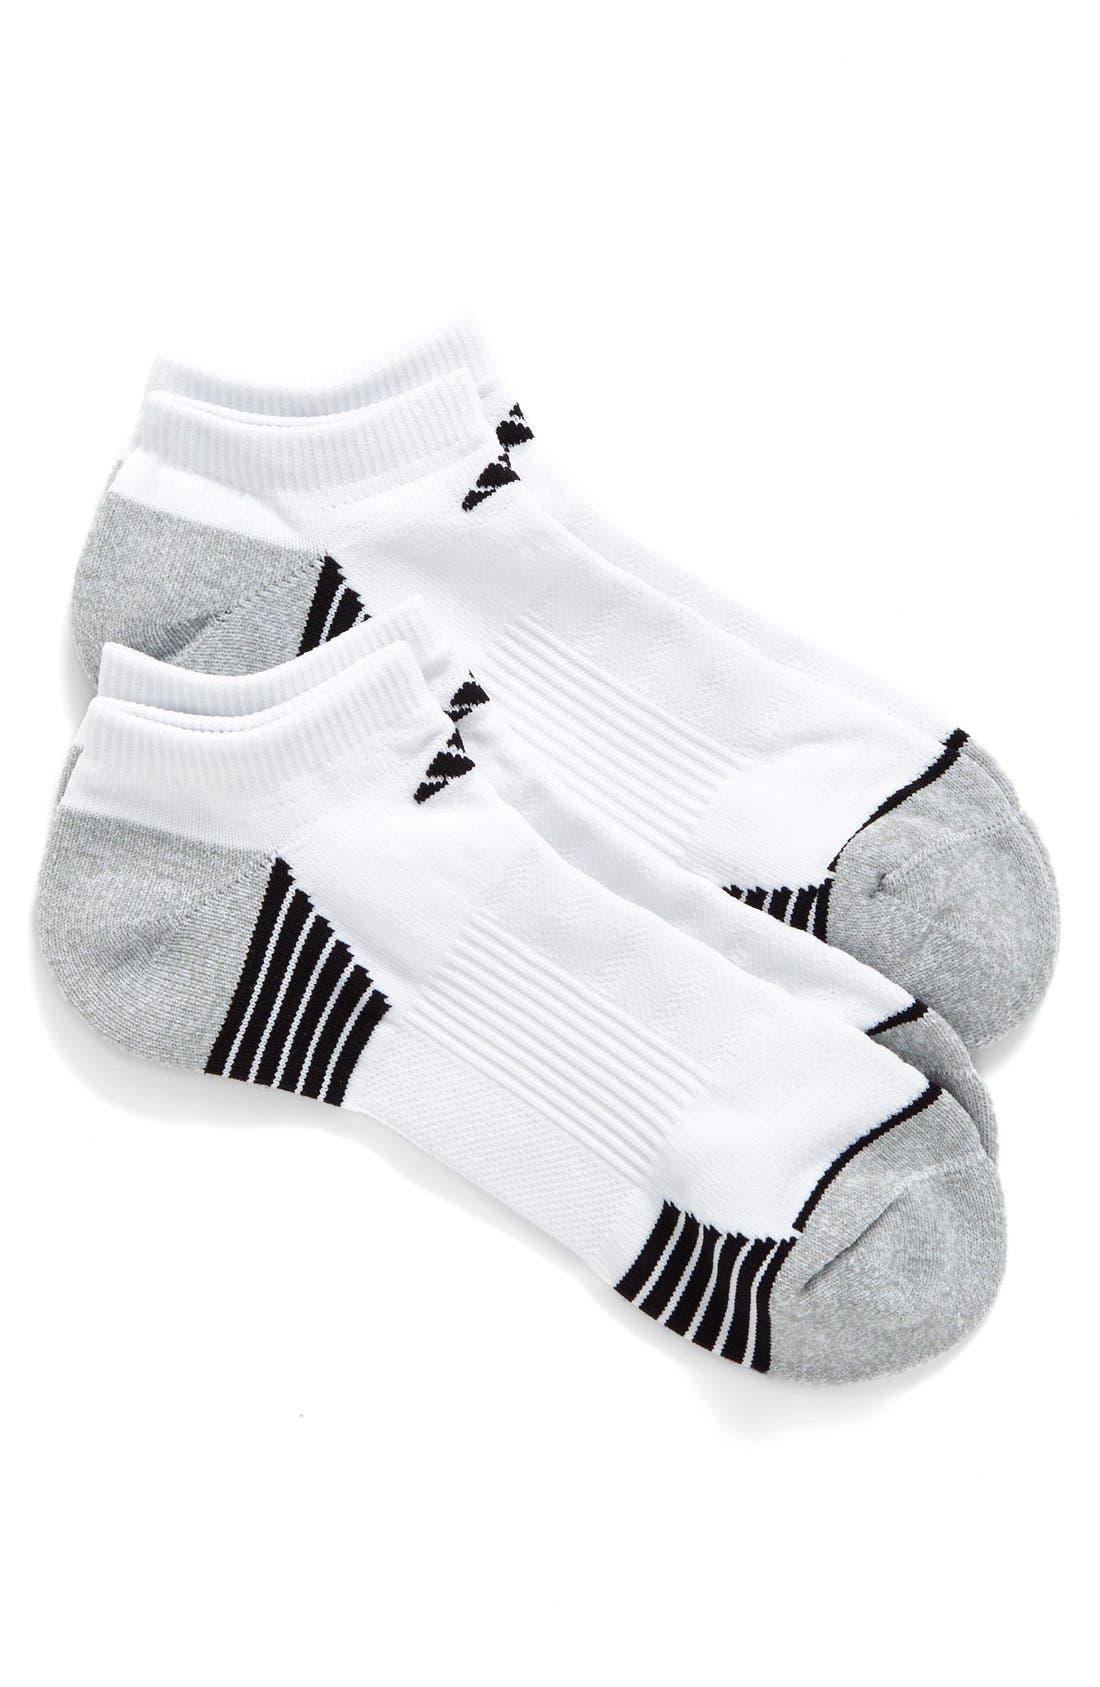 Alternate Image 1 Selected - adidas 2-Pack Superlite Speed No-Show Socks